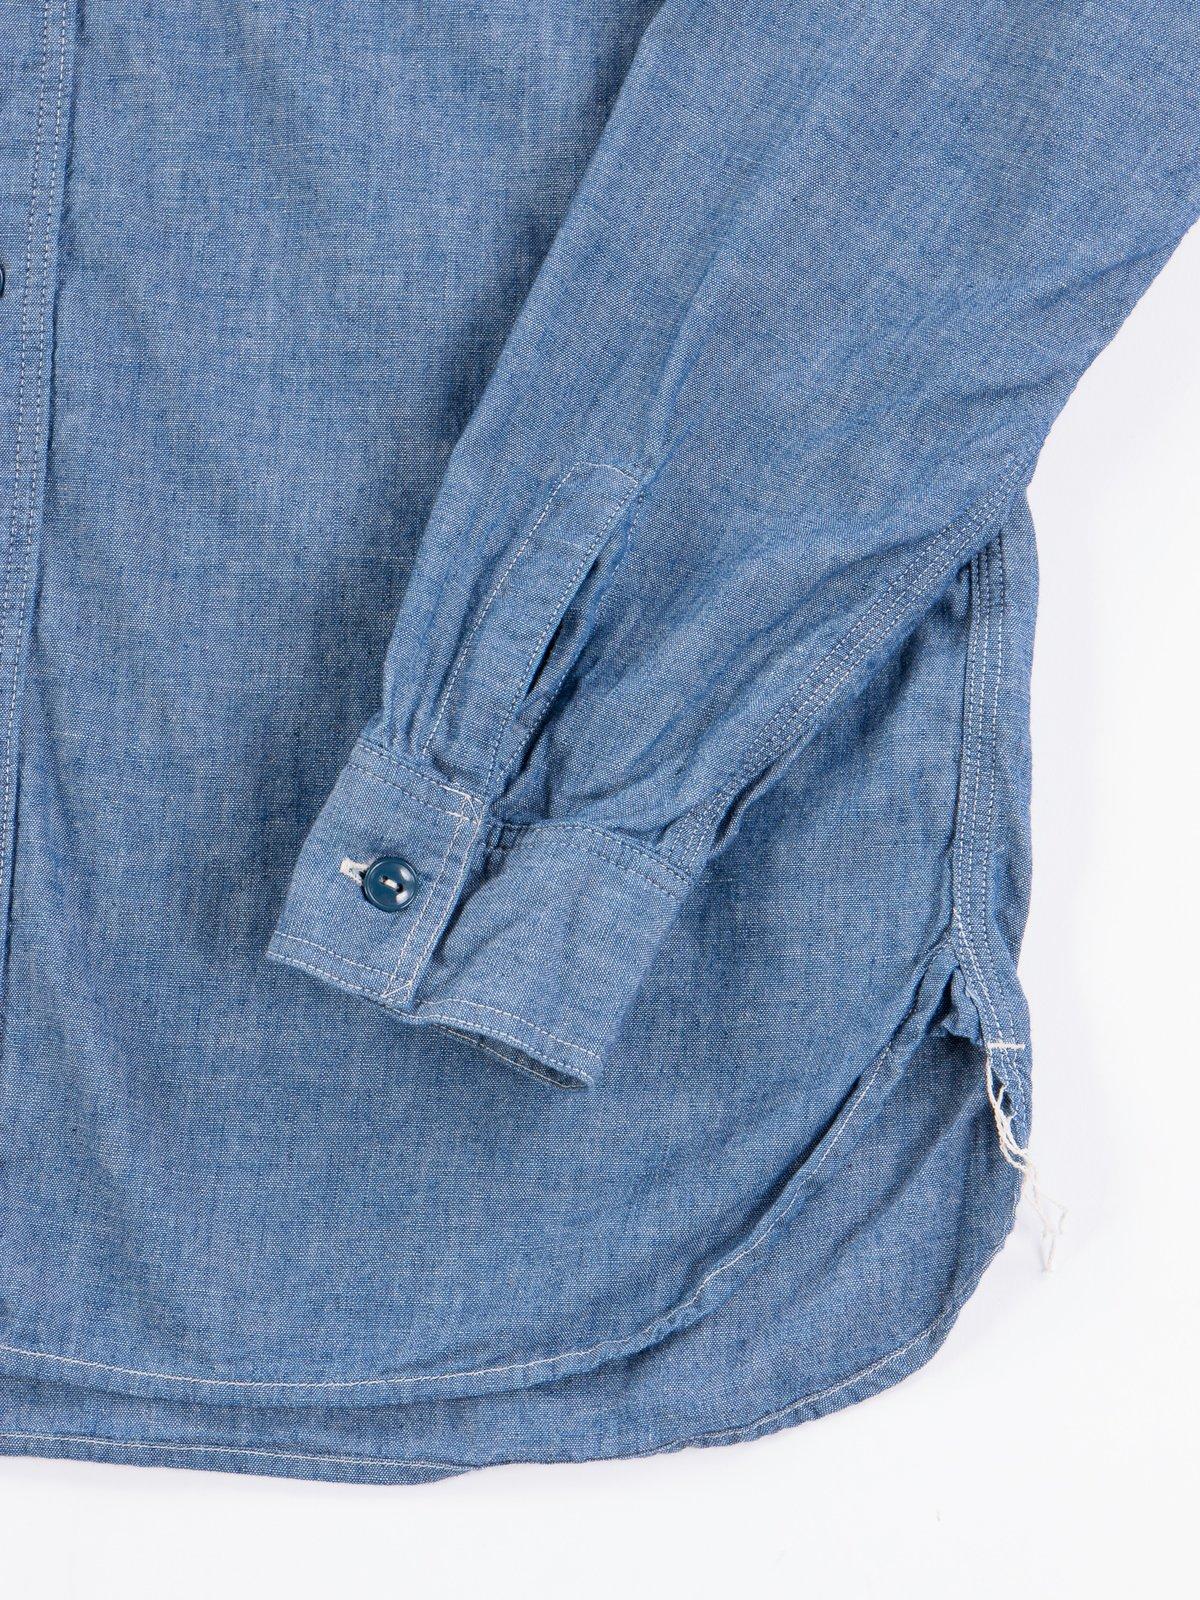 Blue Chambray Work Shirt - Image 4